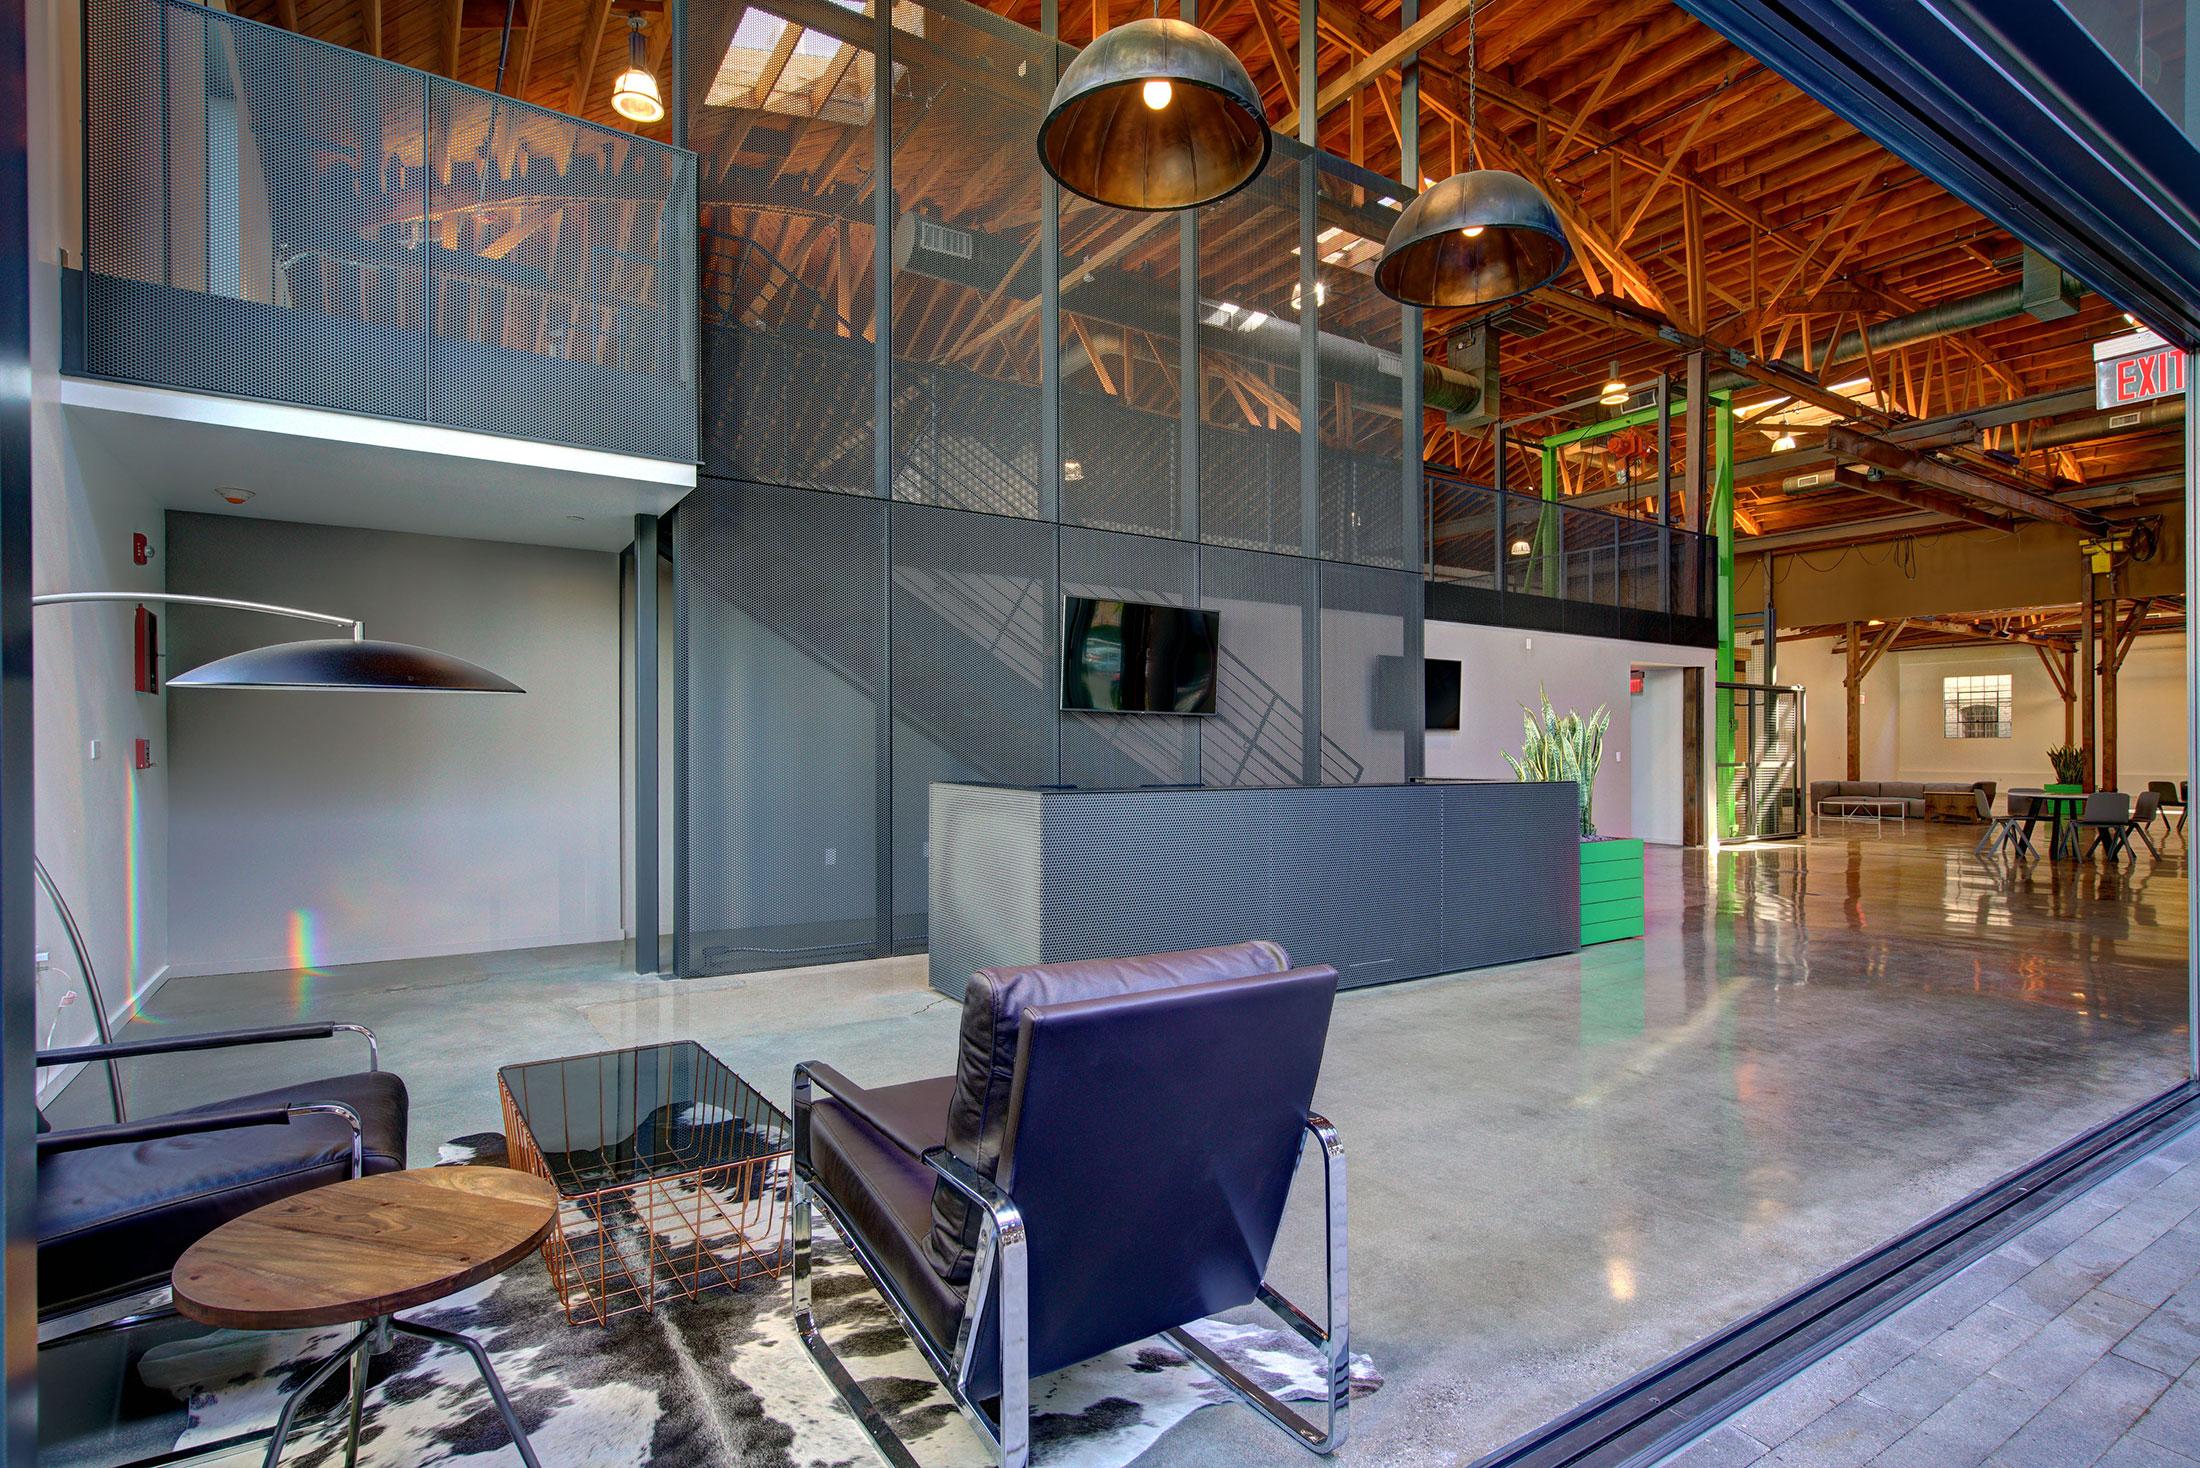 modern-architecture-building-adaptive-reuse-workplace-interior-shubindonaldson-720cahuenga-1